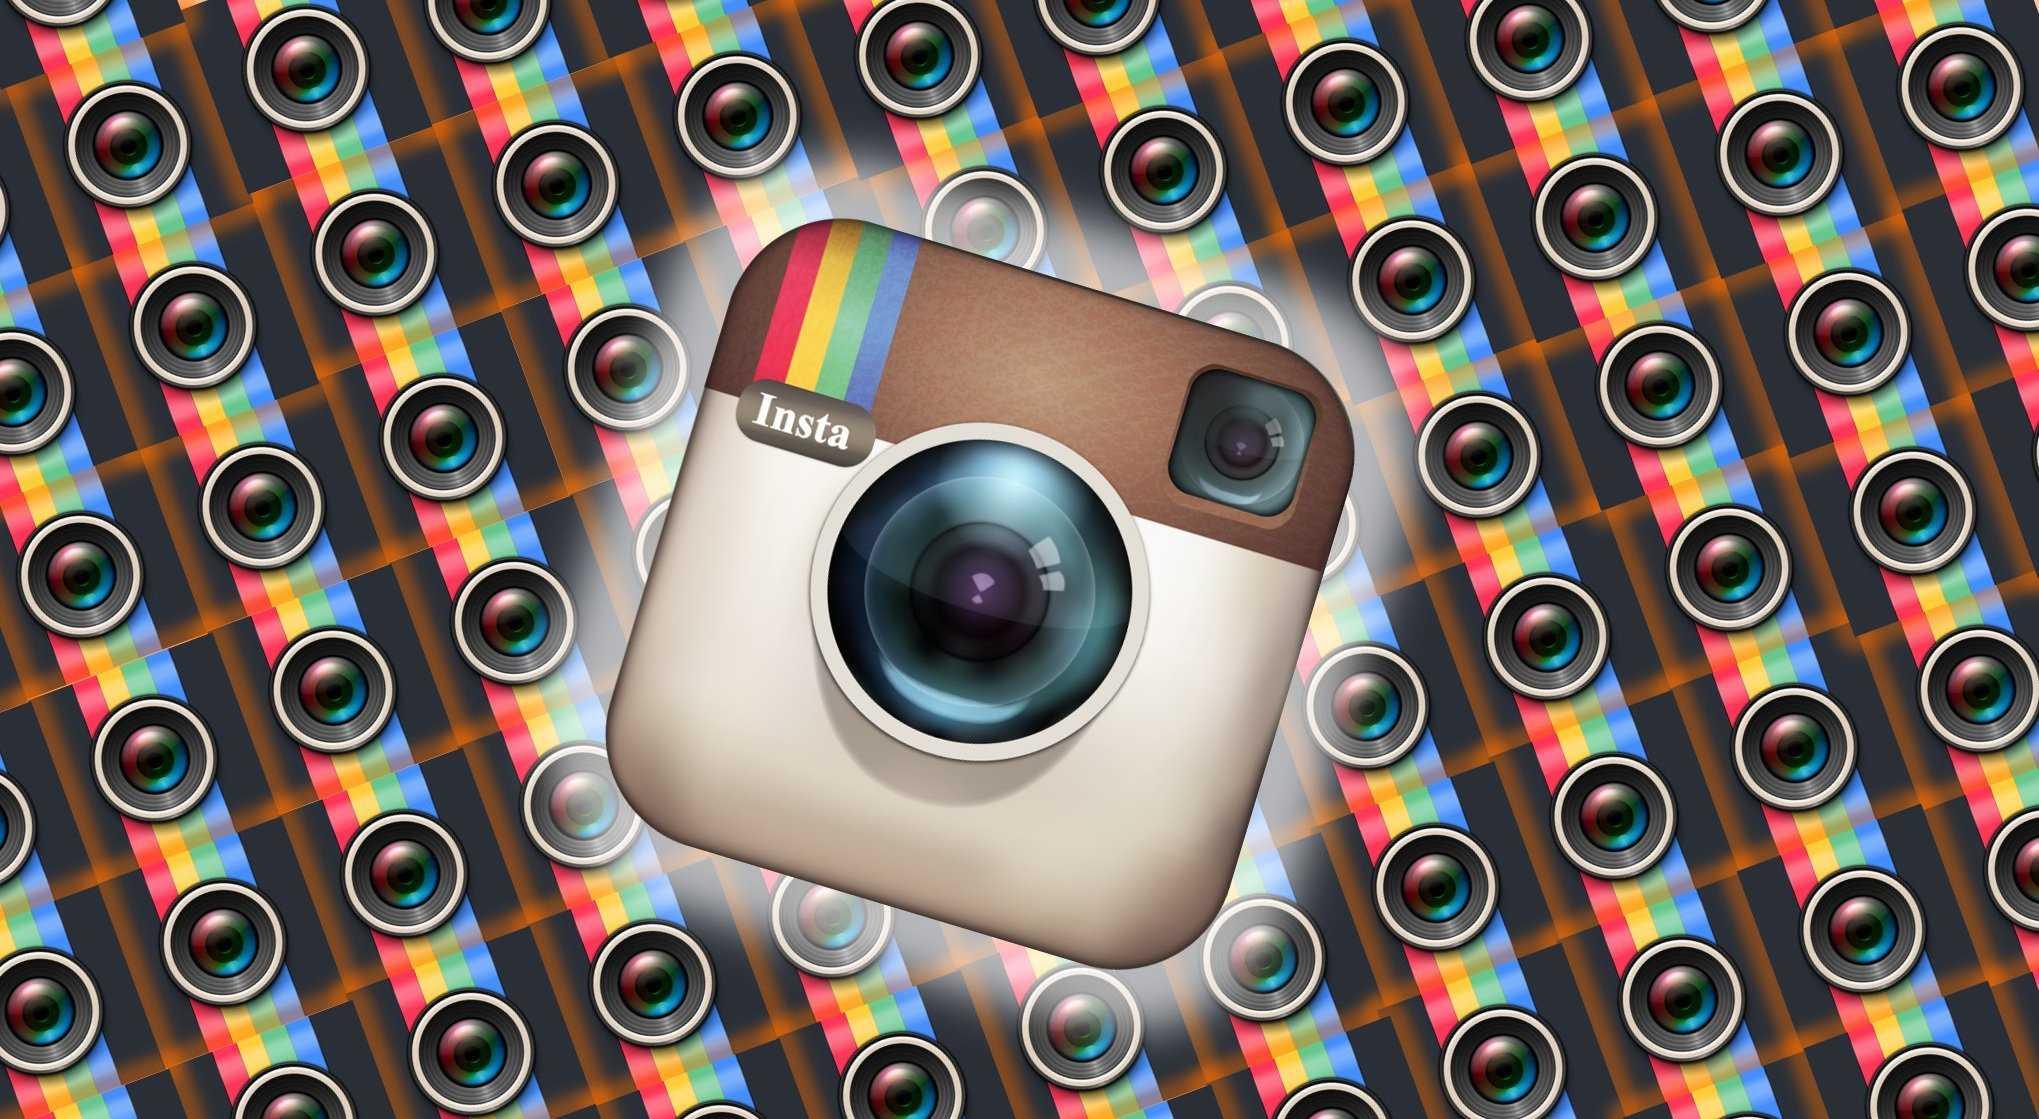 1919e09b4 تحميل برنامج انستقرام مجانا Download Instagram free برابط مباشر